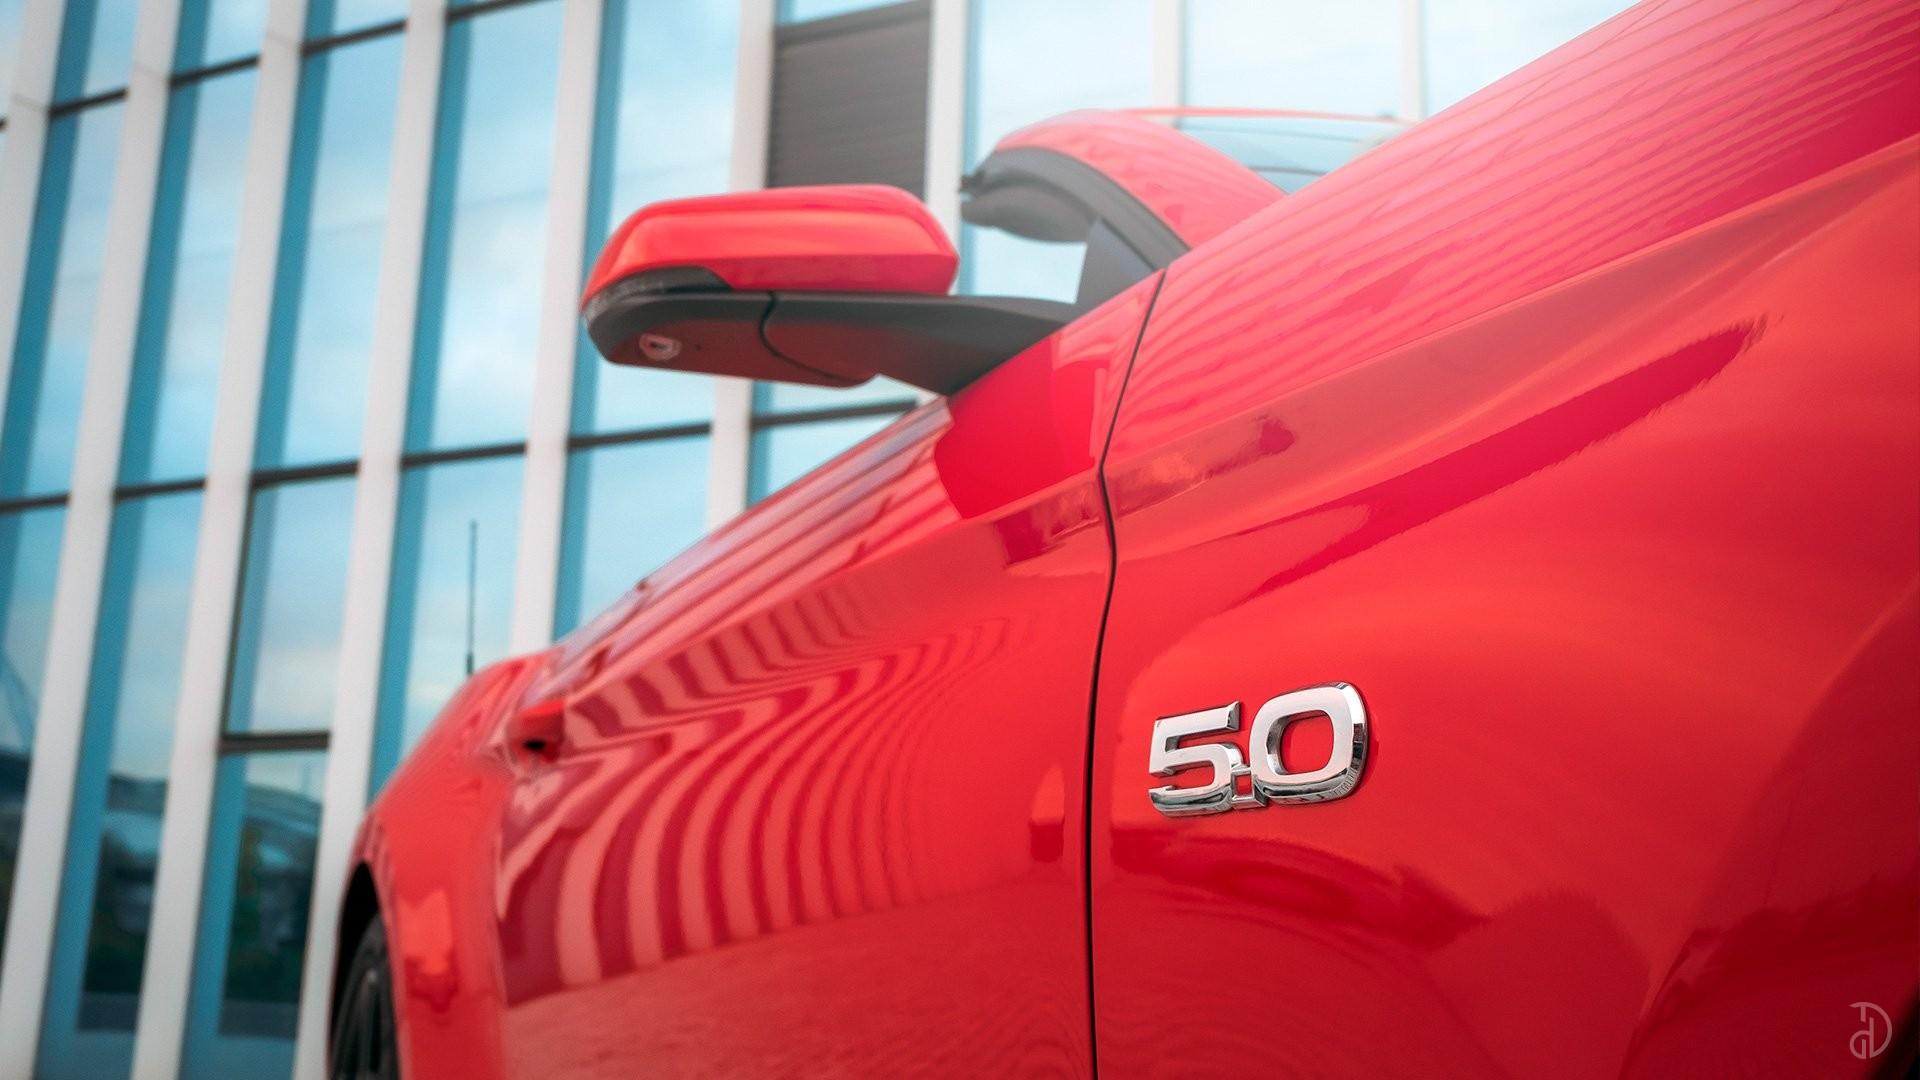 Аренда Ford Mustang GT 5.0  в Москве. Фото 11